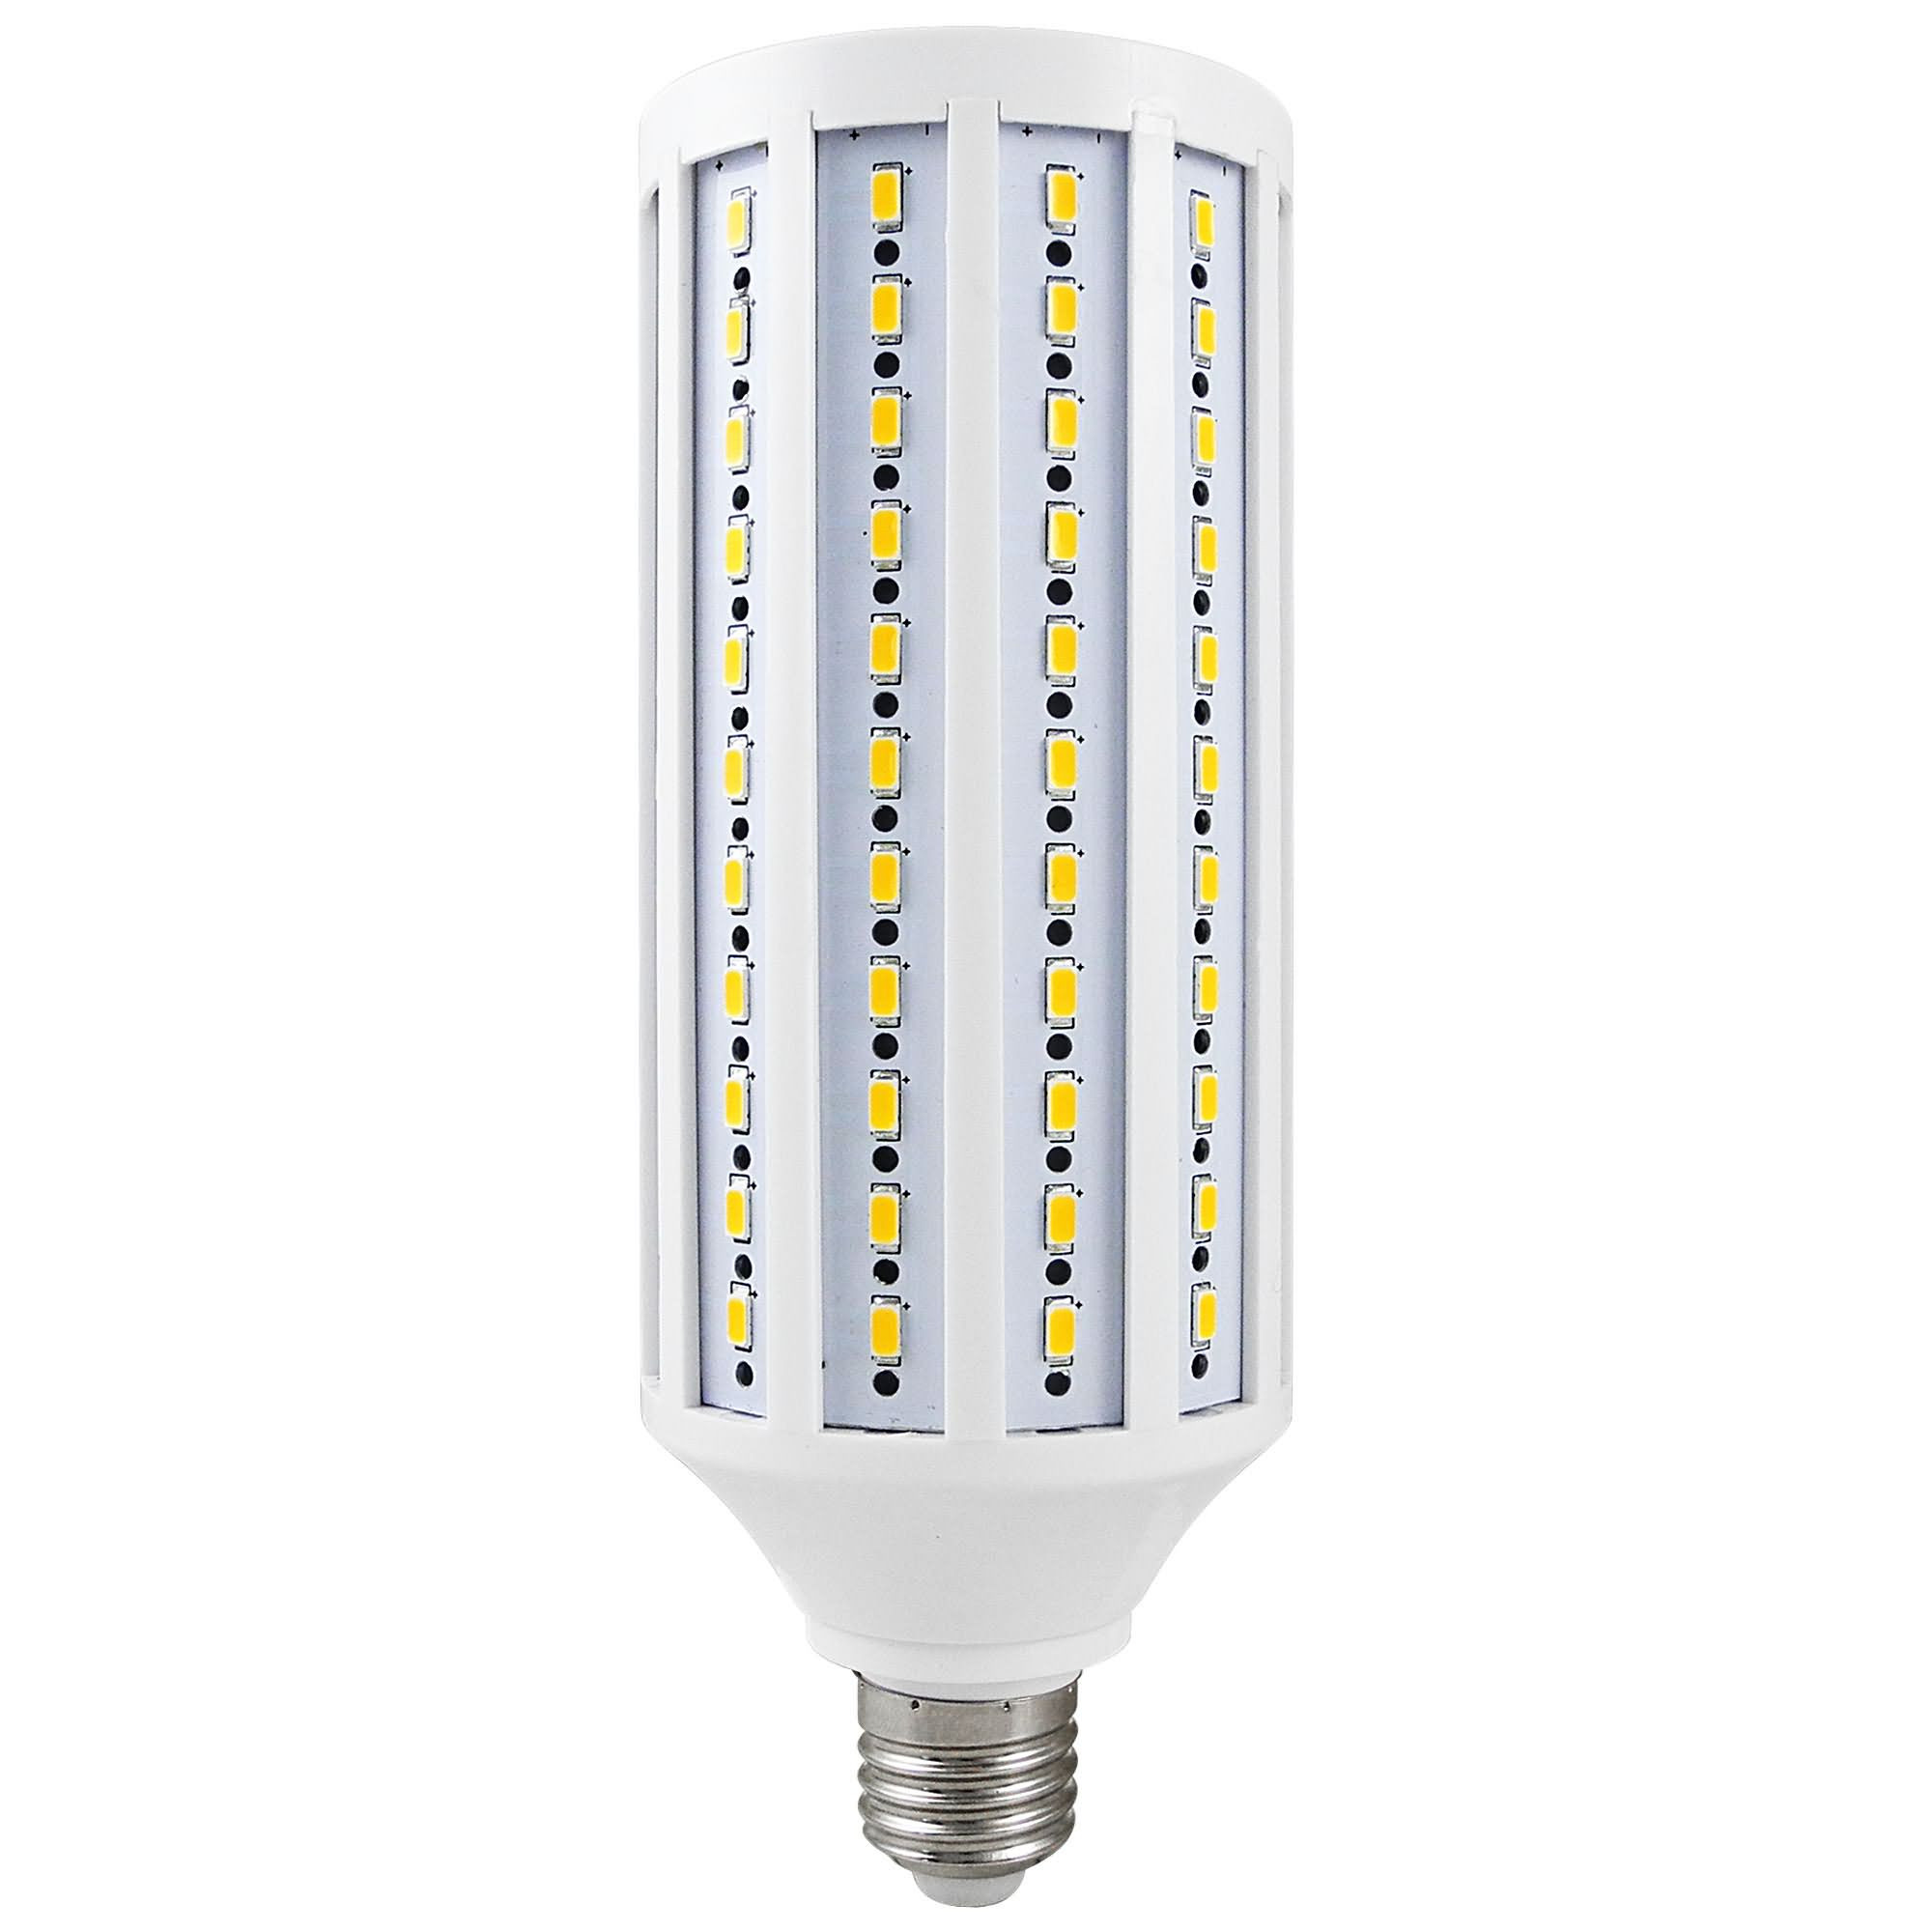 e27 30w led corn light 165x 5730 smd leds led bulb in cool. Black Bedroom Furniture Sets. Home Design Ideas